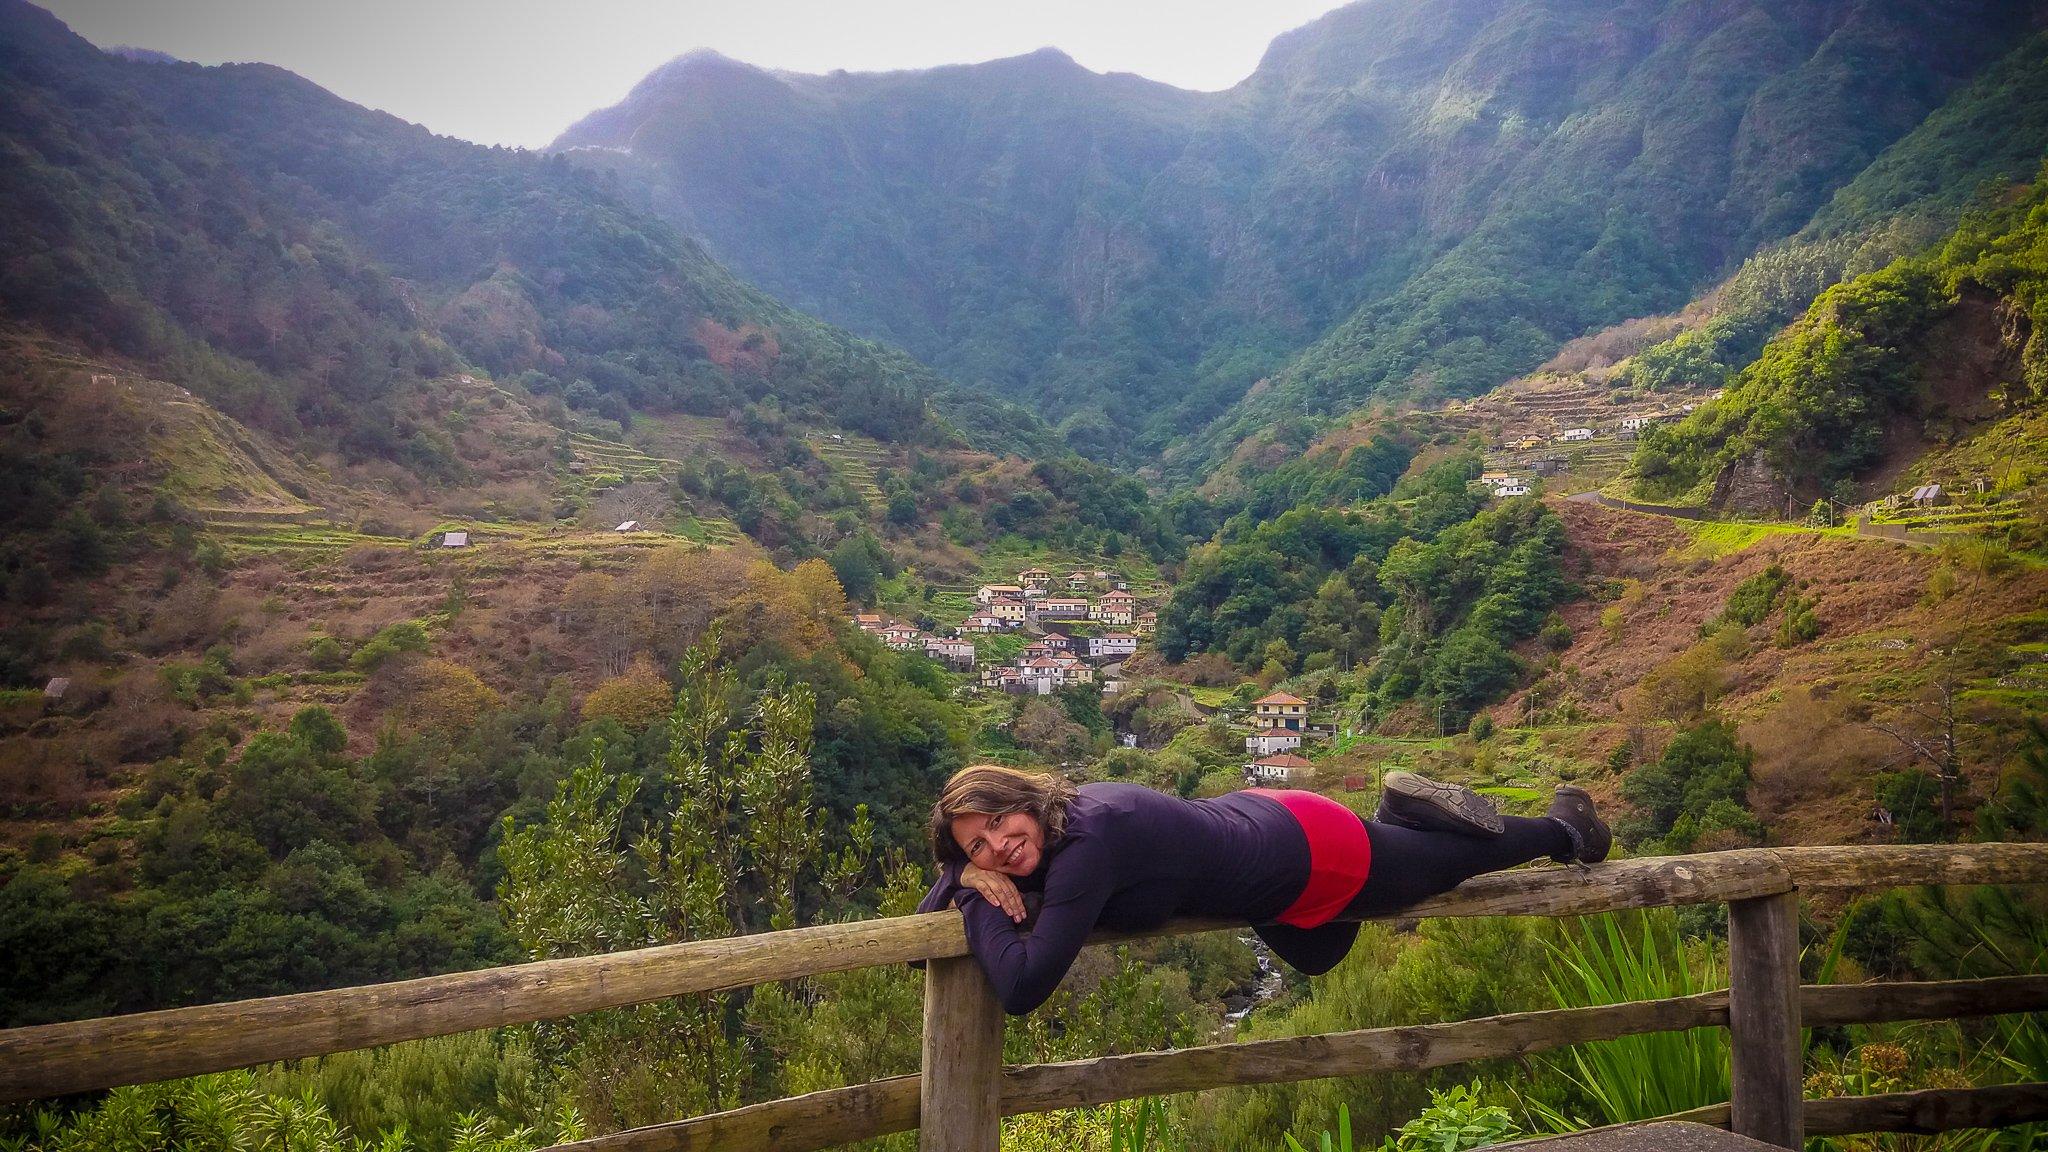 I'm in love with Madeira island. #madeiraful #visitmadeira #sharingmadeira https://t.co/HTd1E4EzHc